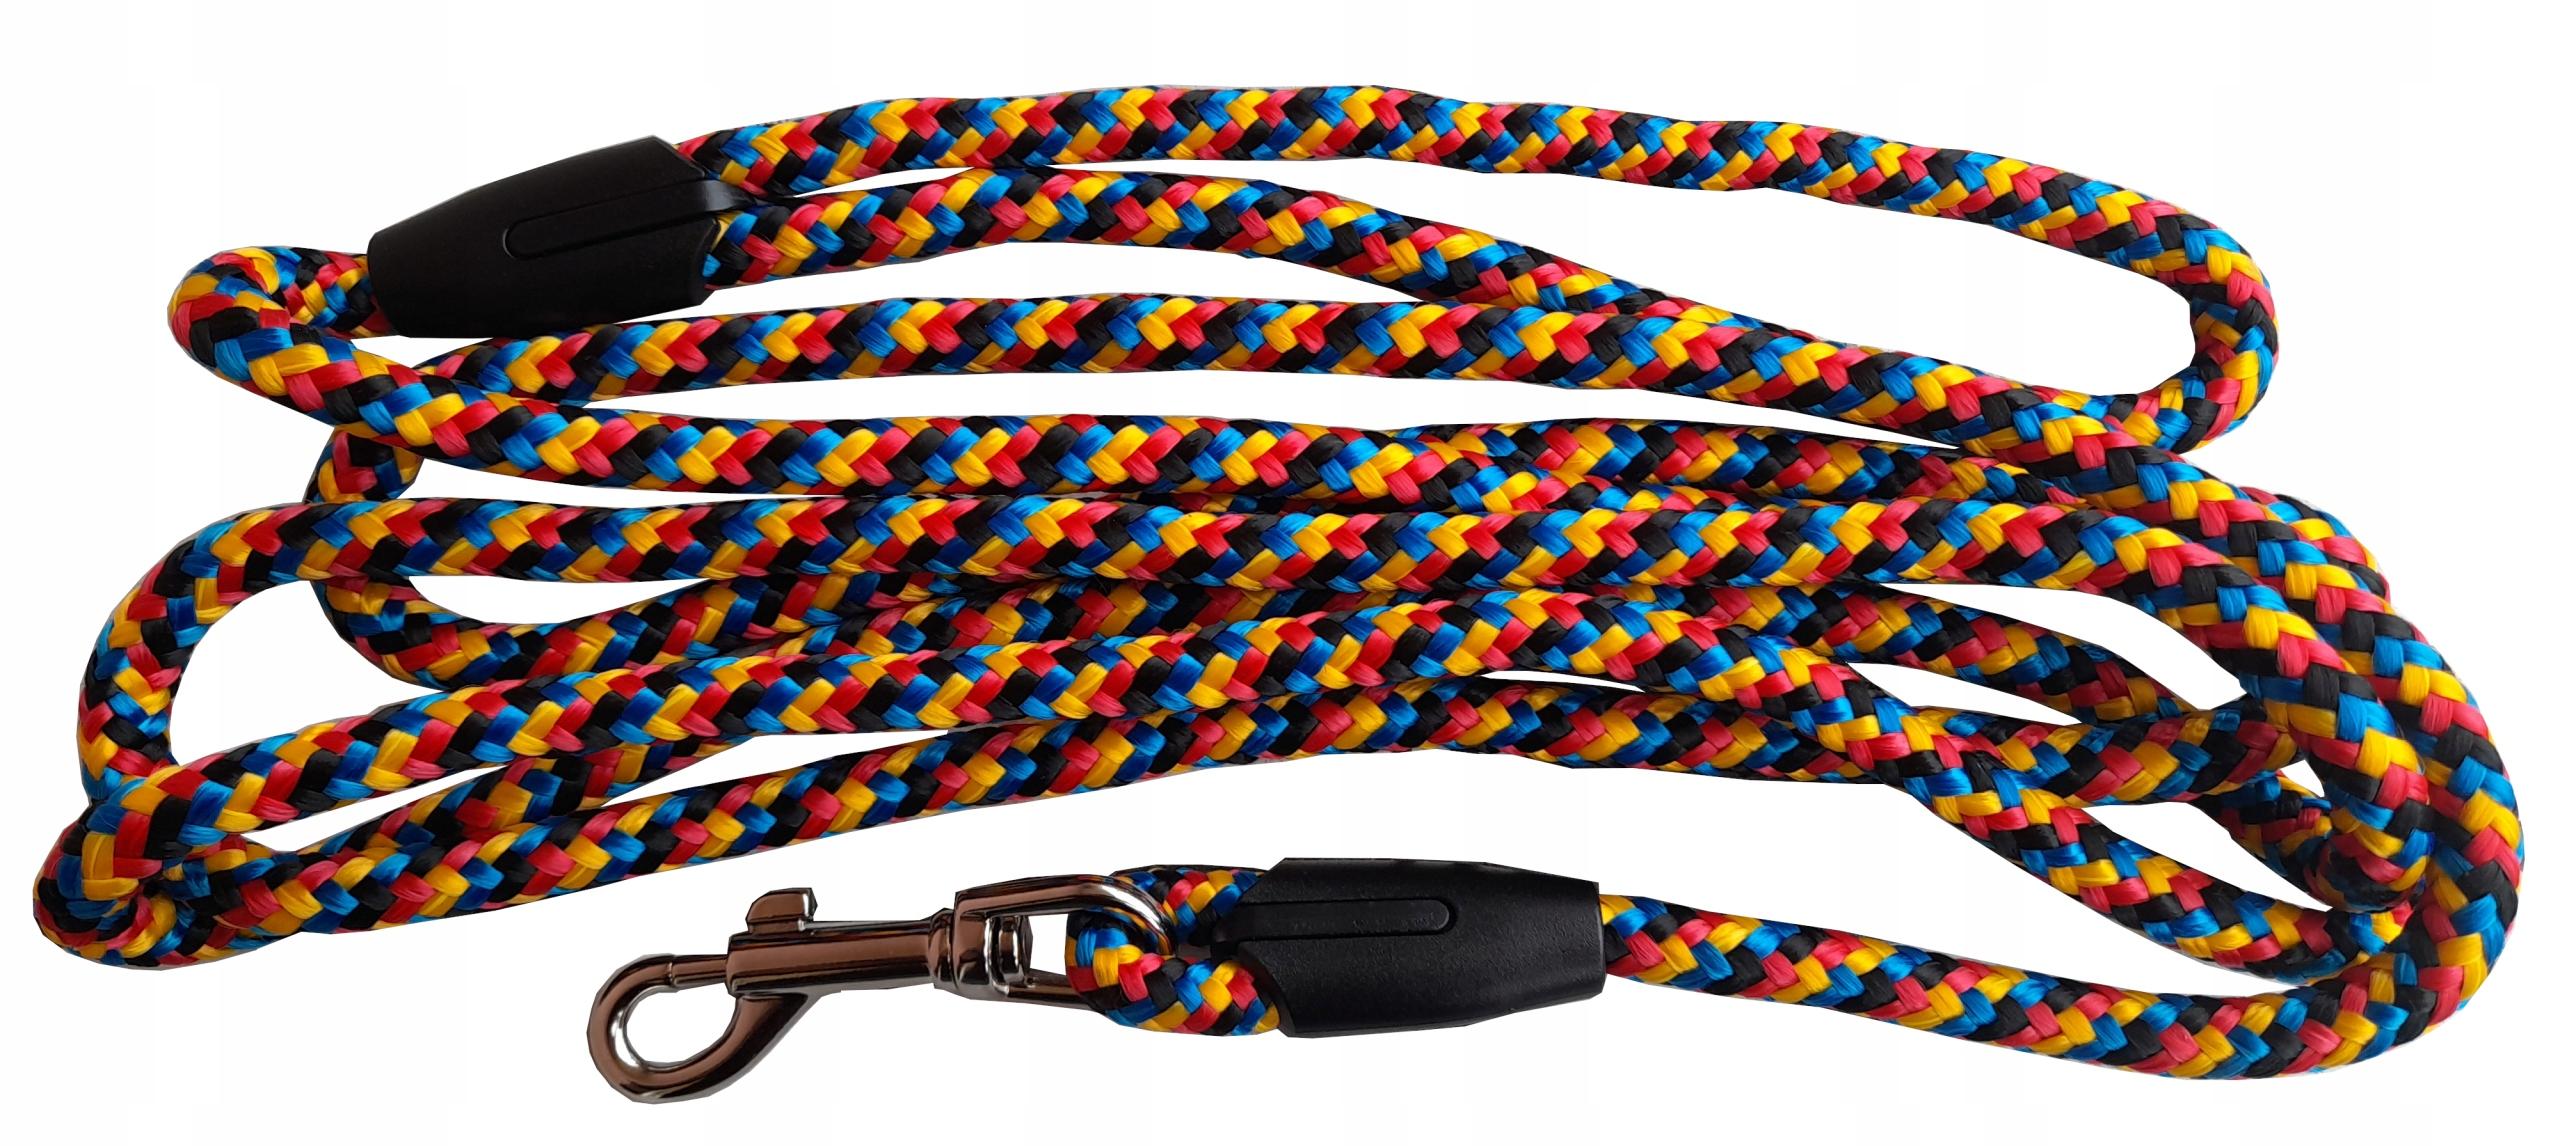 веревочный поводок 10мм 2м для собаки LXL Colourful Strong